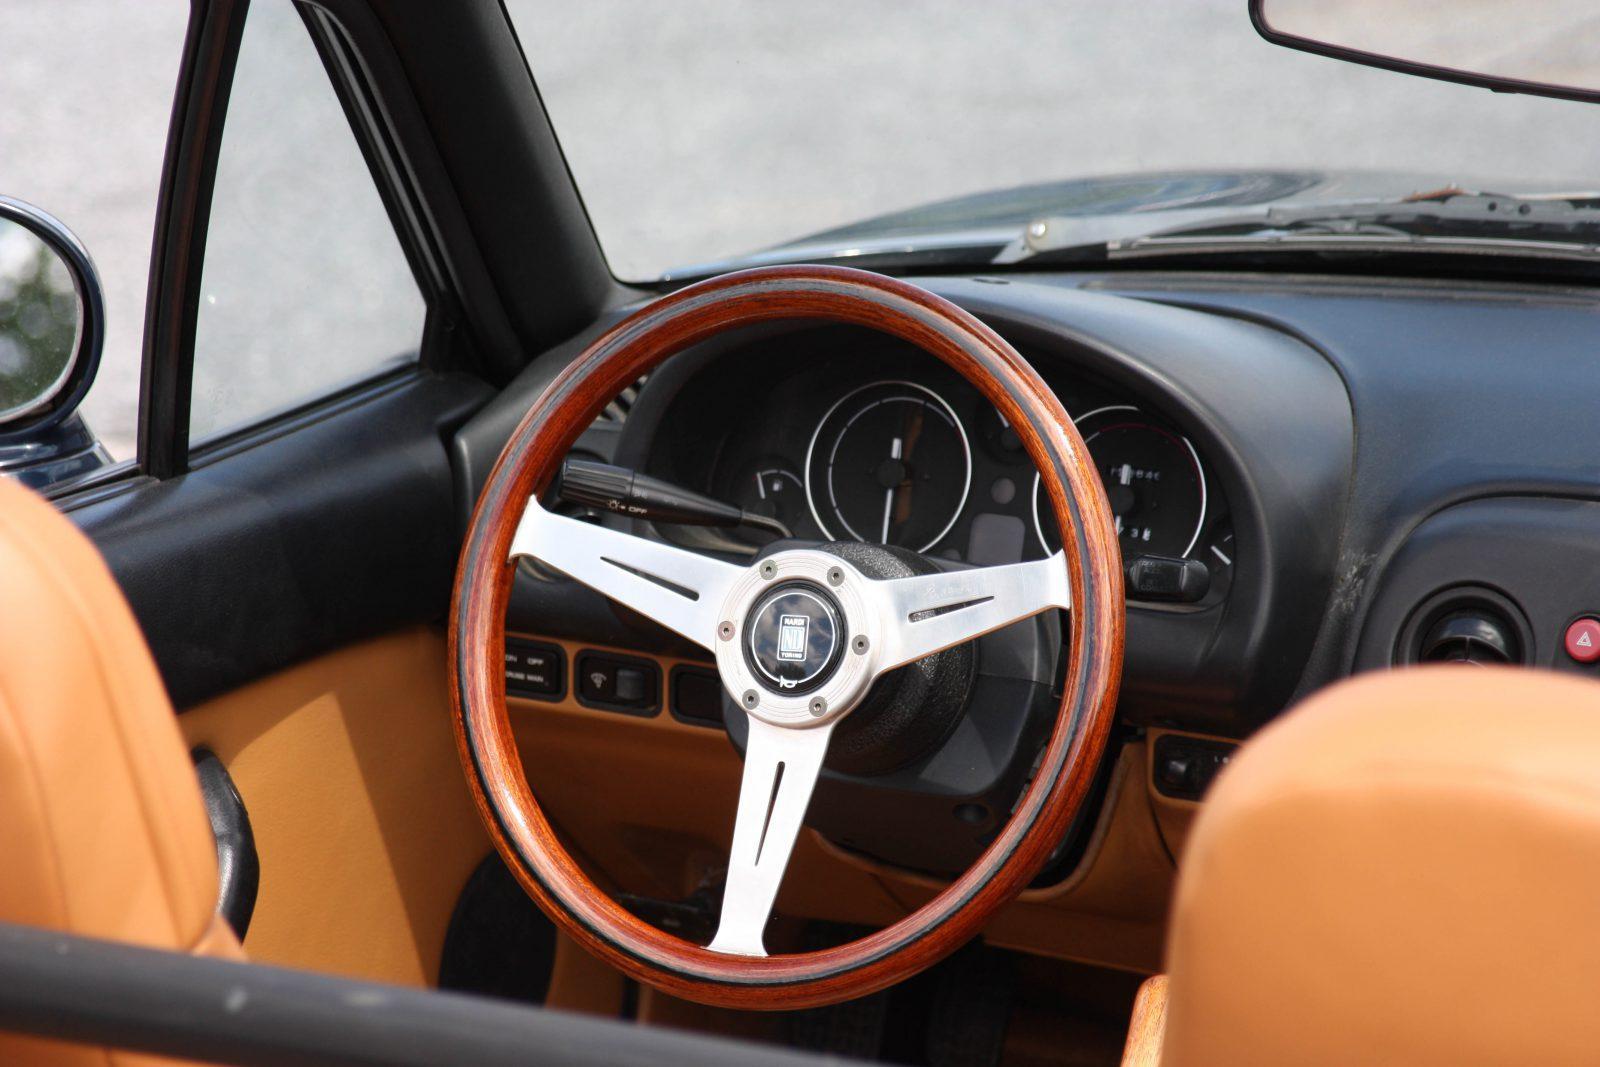 steering wheel slightly off center